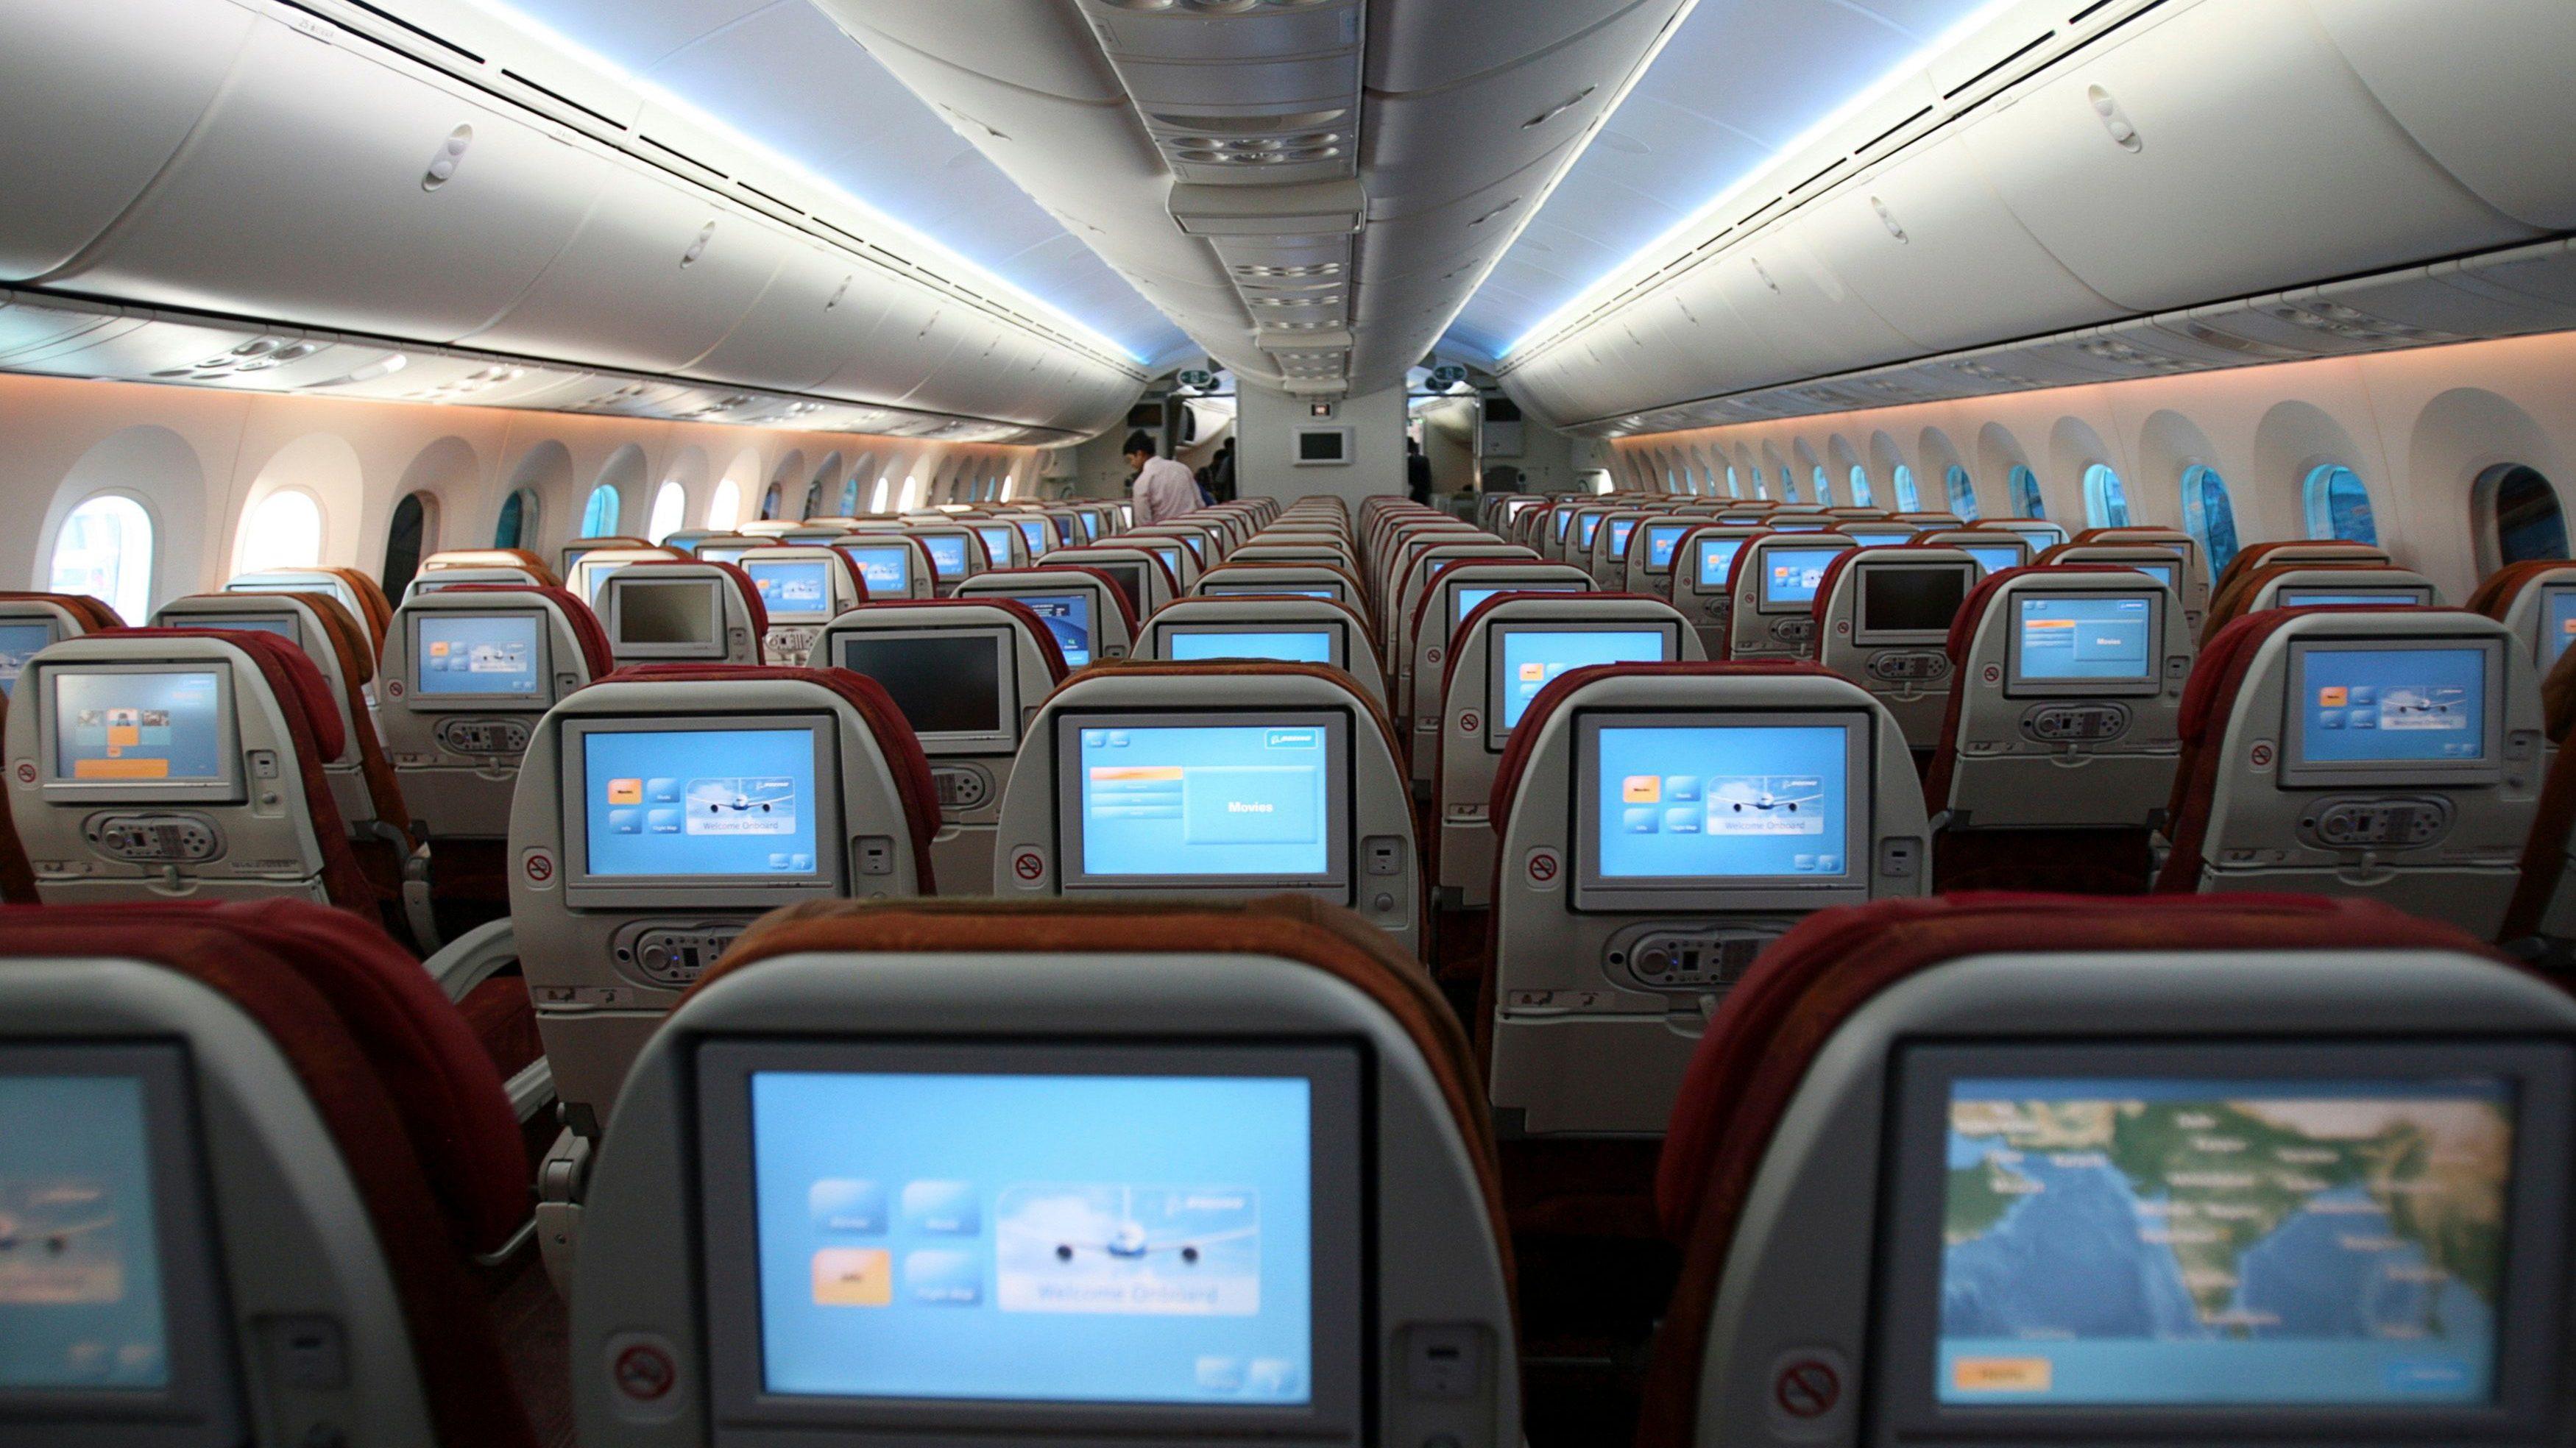 plf-india-airline-load-factor-rpk-ask-iata